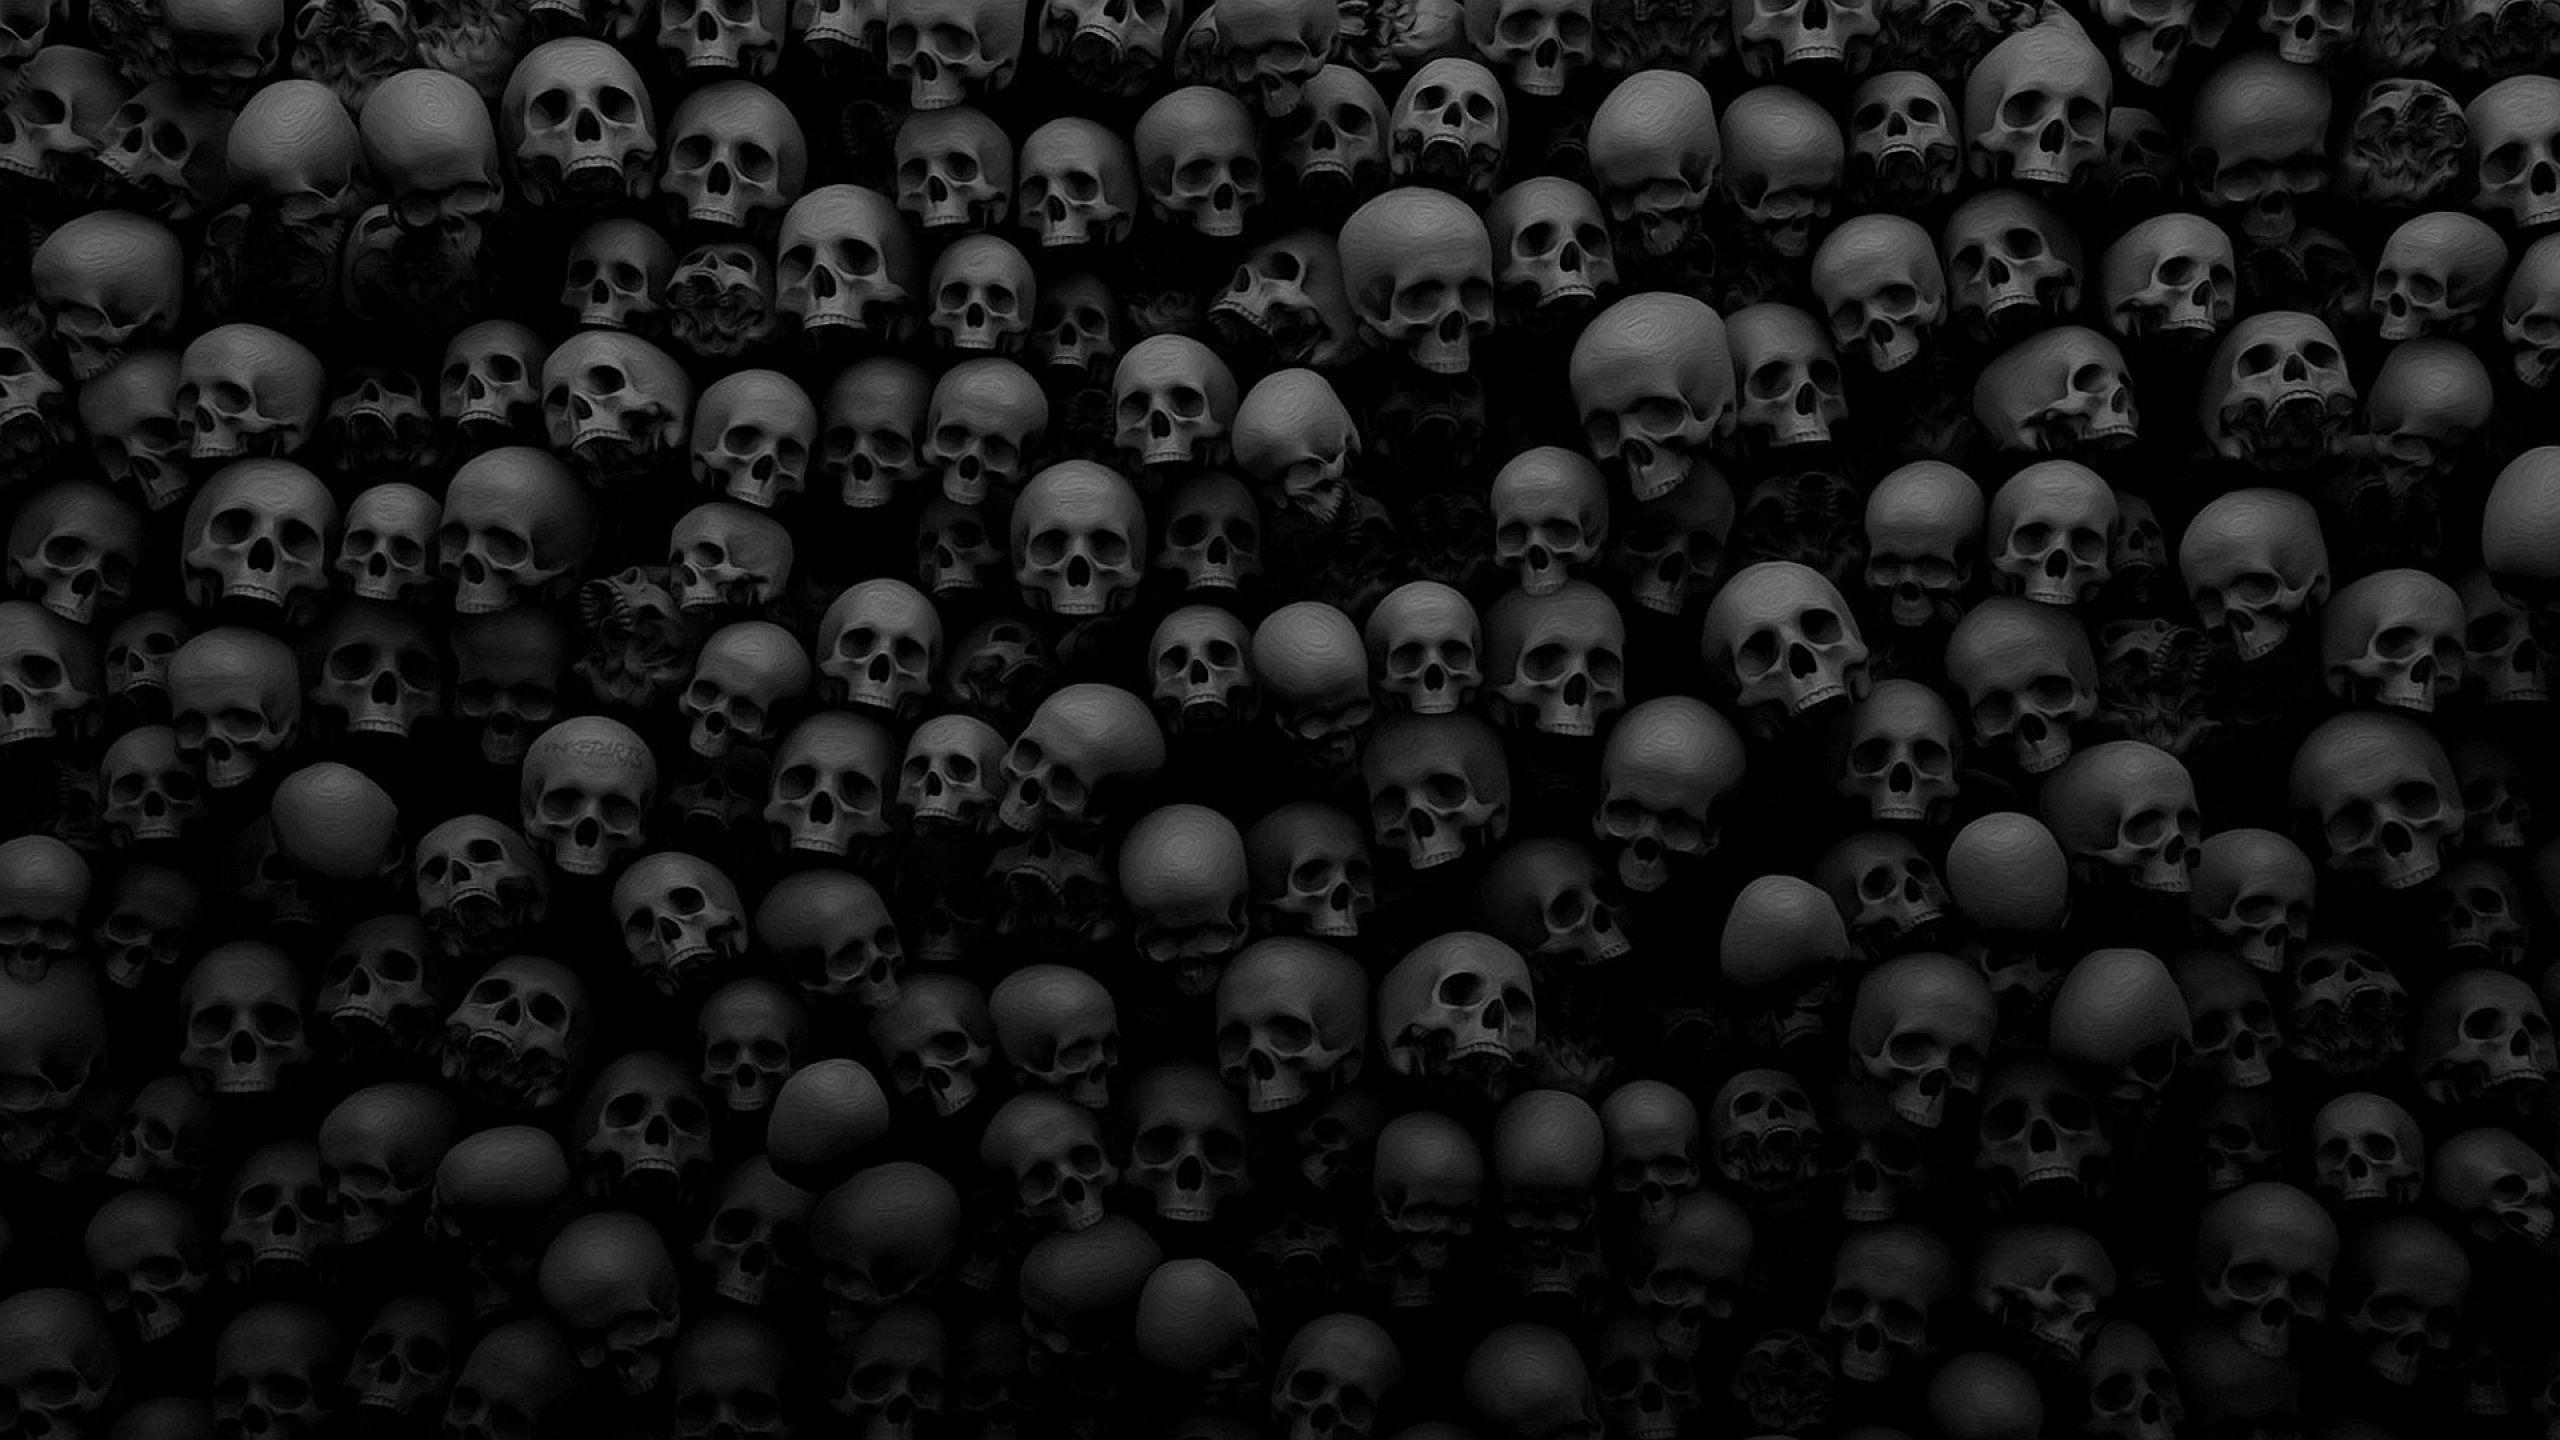 Dark Evil Horror Spooky Creepy Scary Wallpaper 2560x1440 Scary Wallpaper Black Skulls Wallpaper Skull Wallpaper